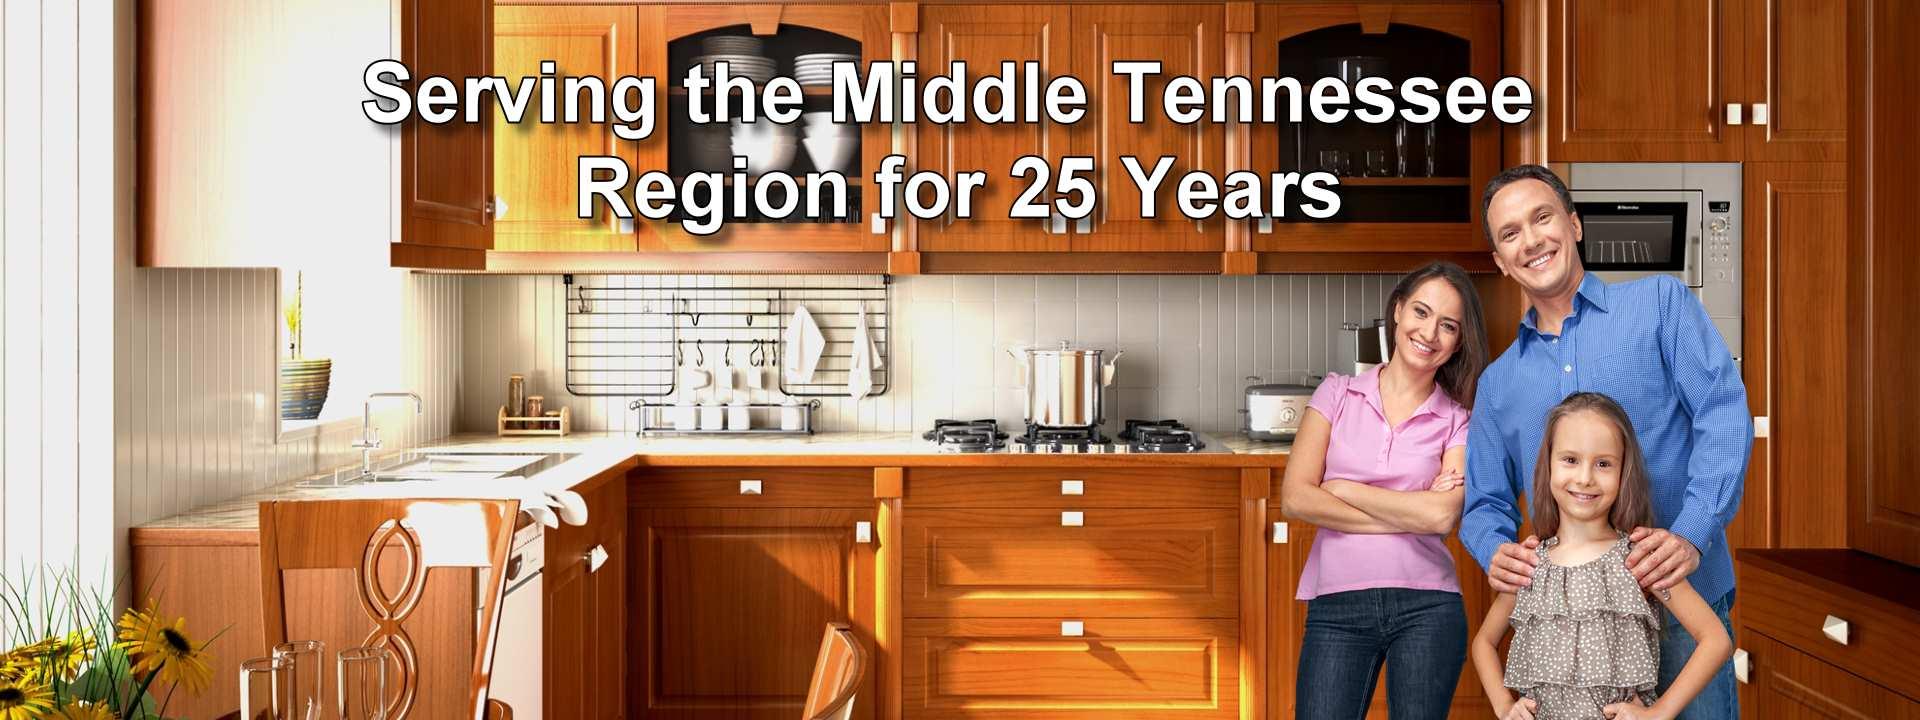 Murfreesboro Tn Home Construction Amp Remodeling Company